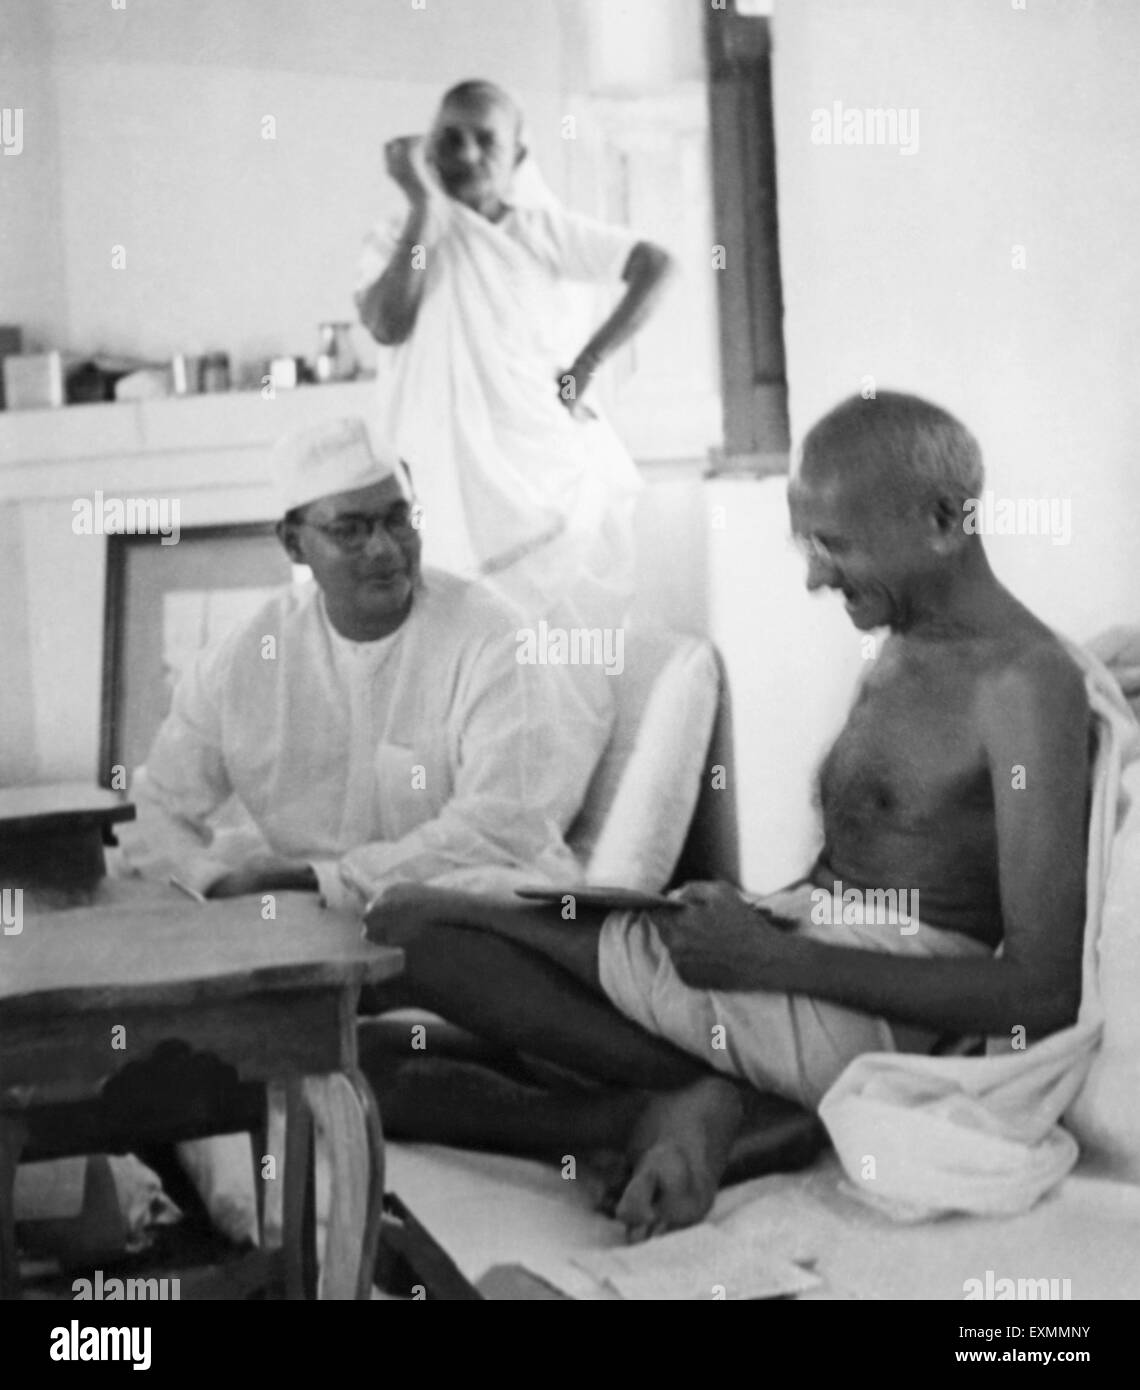 Mahatma Gandhi with Subhash Chandra Bose and Kasturba Gandhi at Birla House ; New Delhi ; 1938 ; India - Stock Image